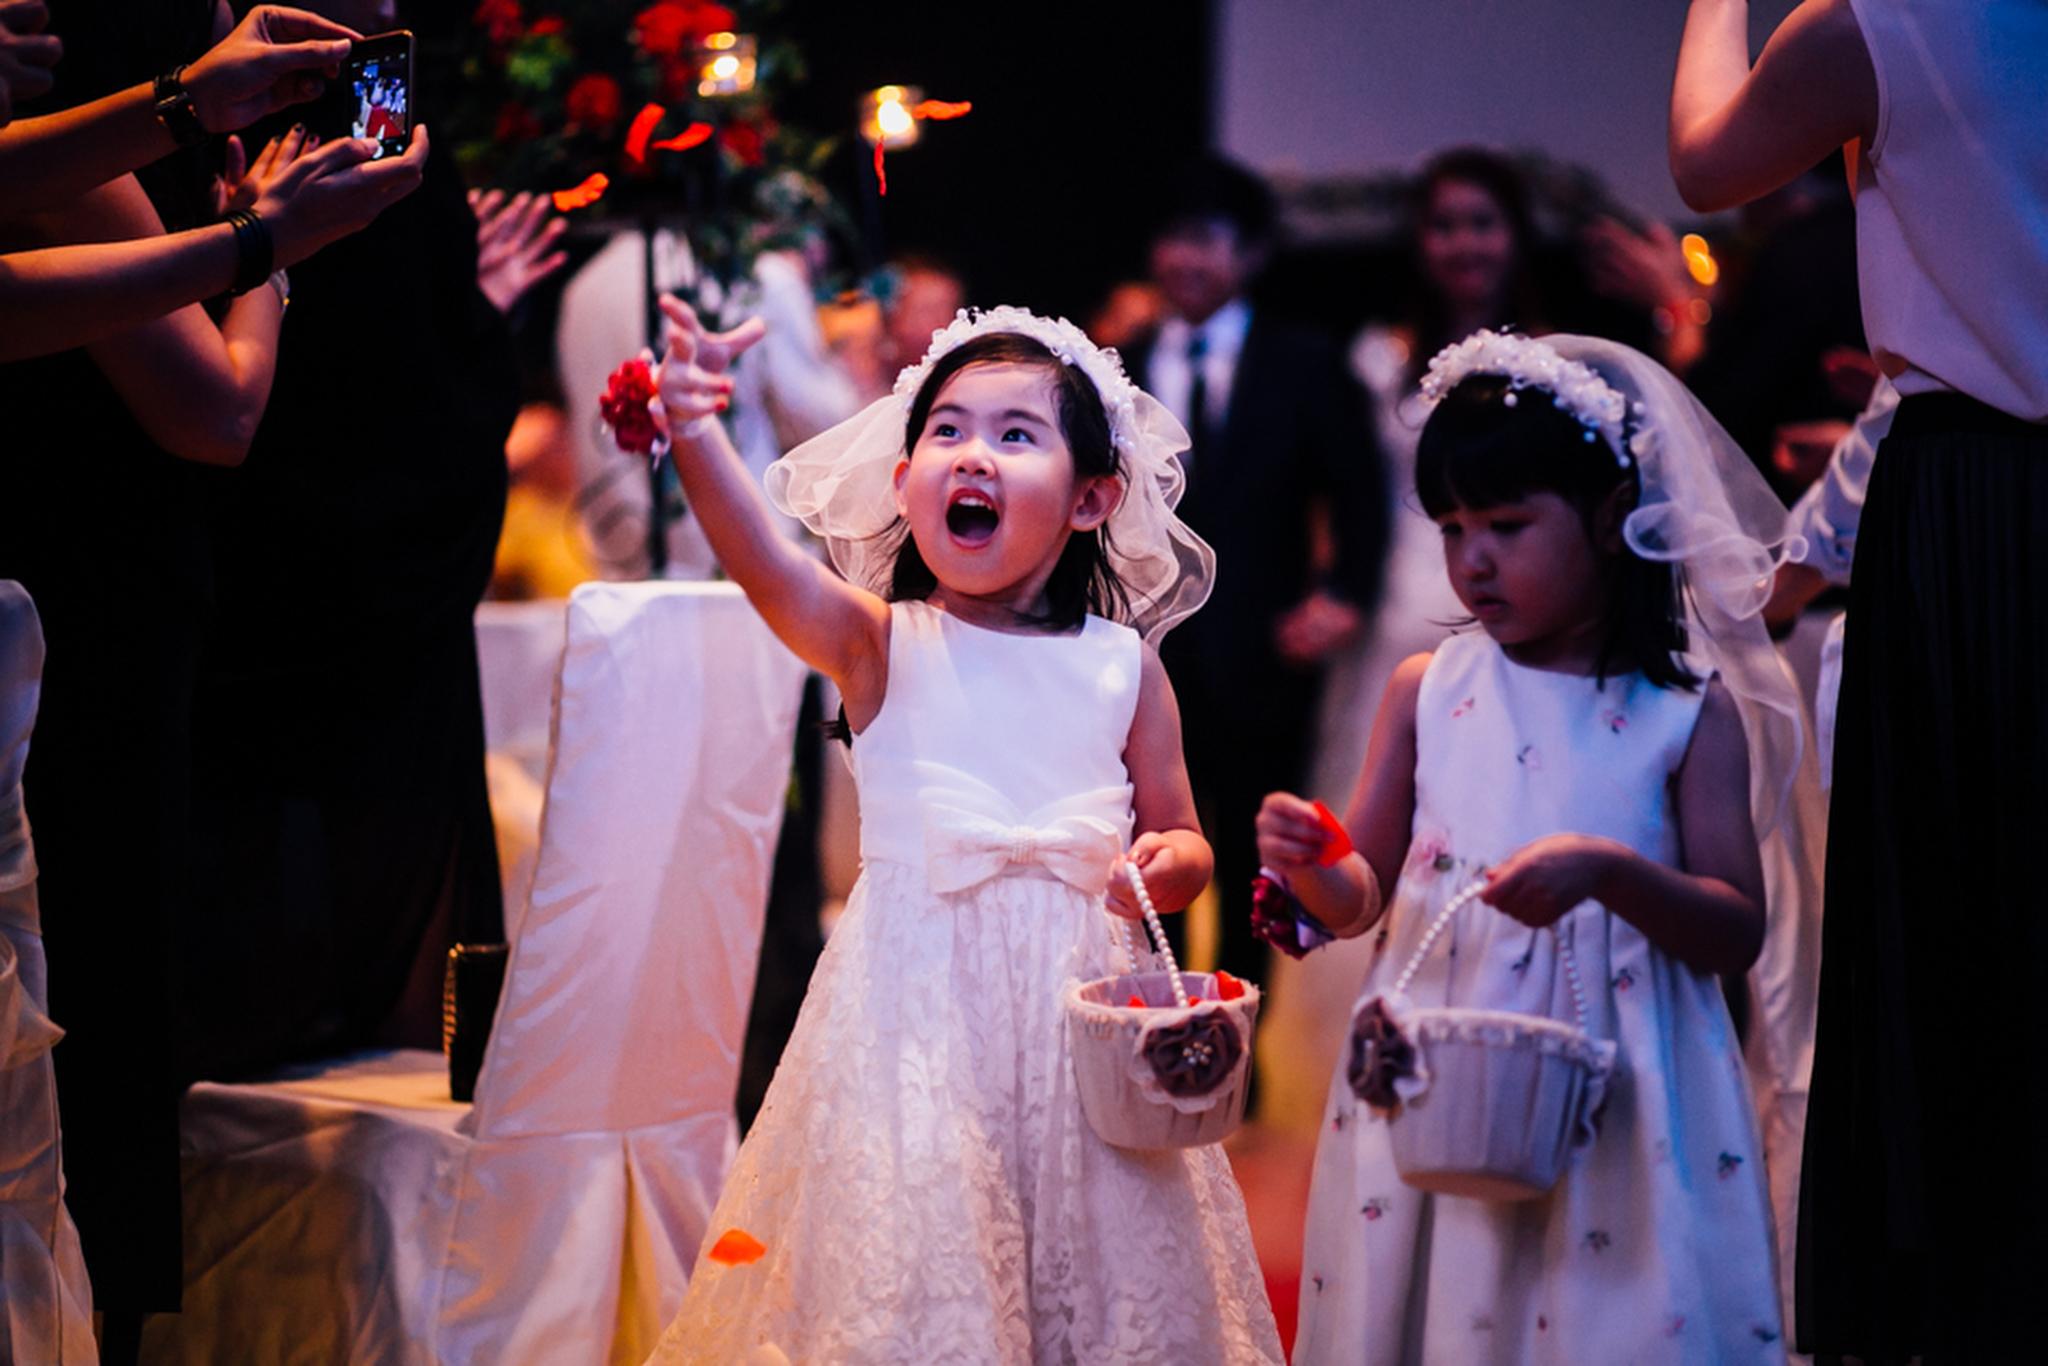 Singapore Wedding Photographer - Jeremy & Kelly Actual Day Wedding (105 of 134).JPG